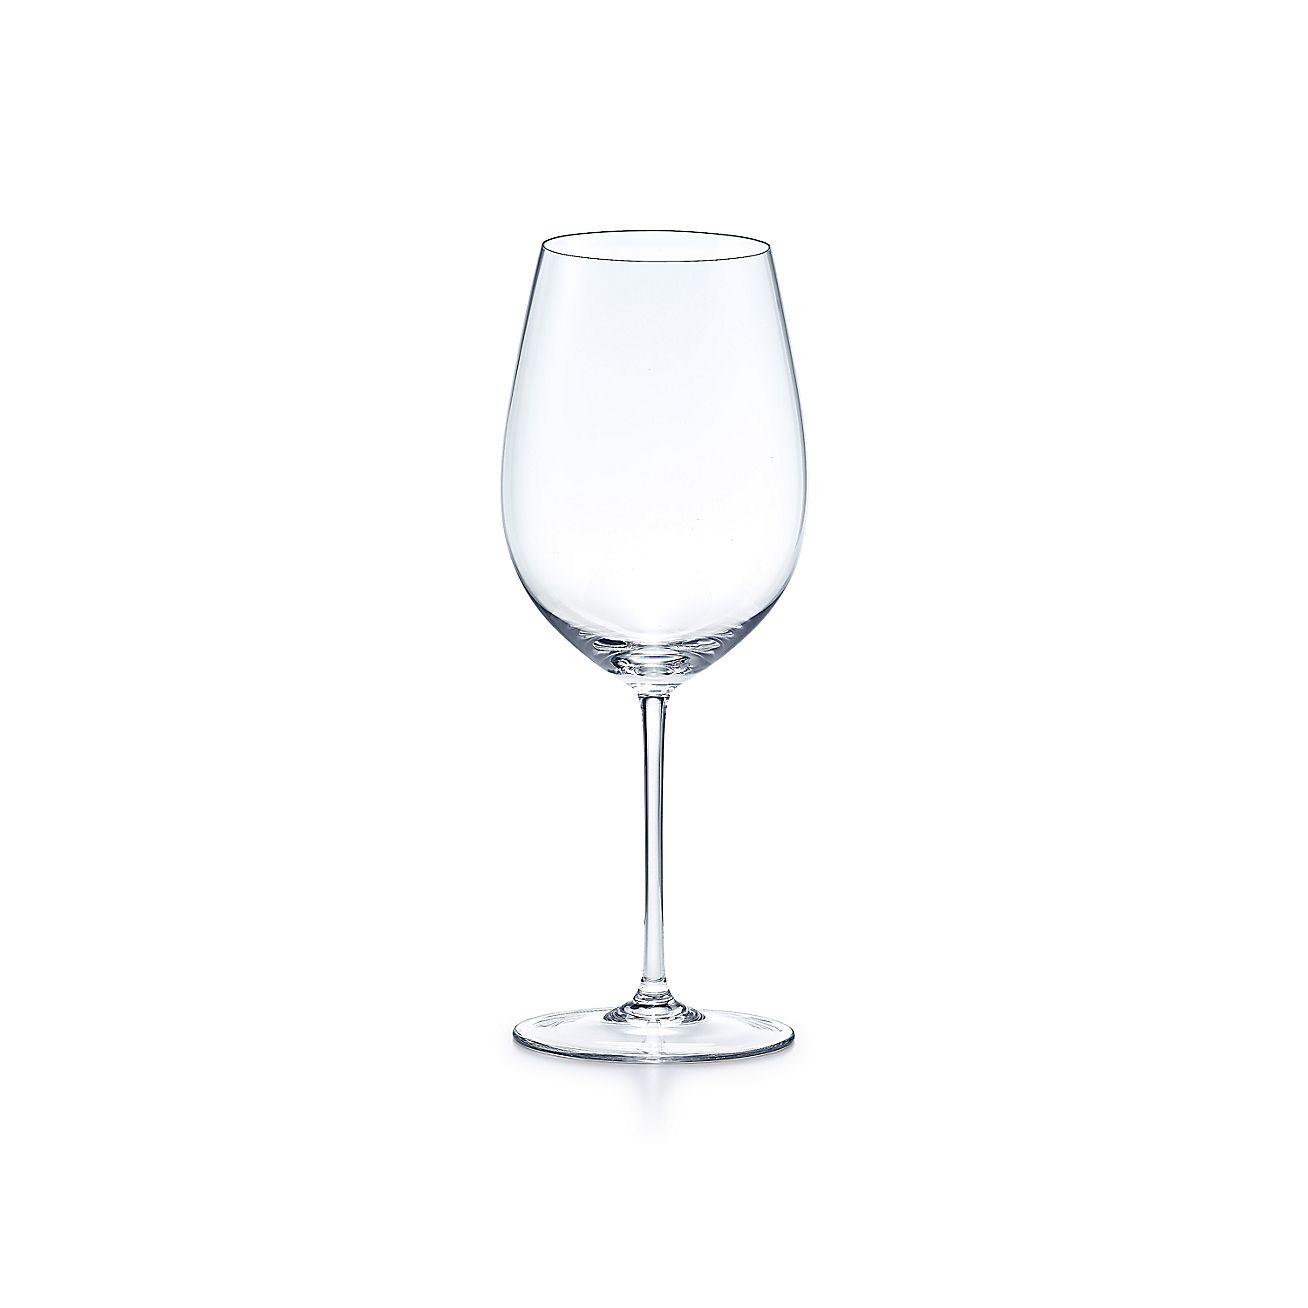 Riedel:Sommeliers Bordeaux<br>Grand Cru Wine Glass